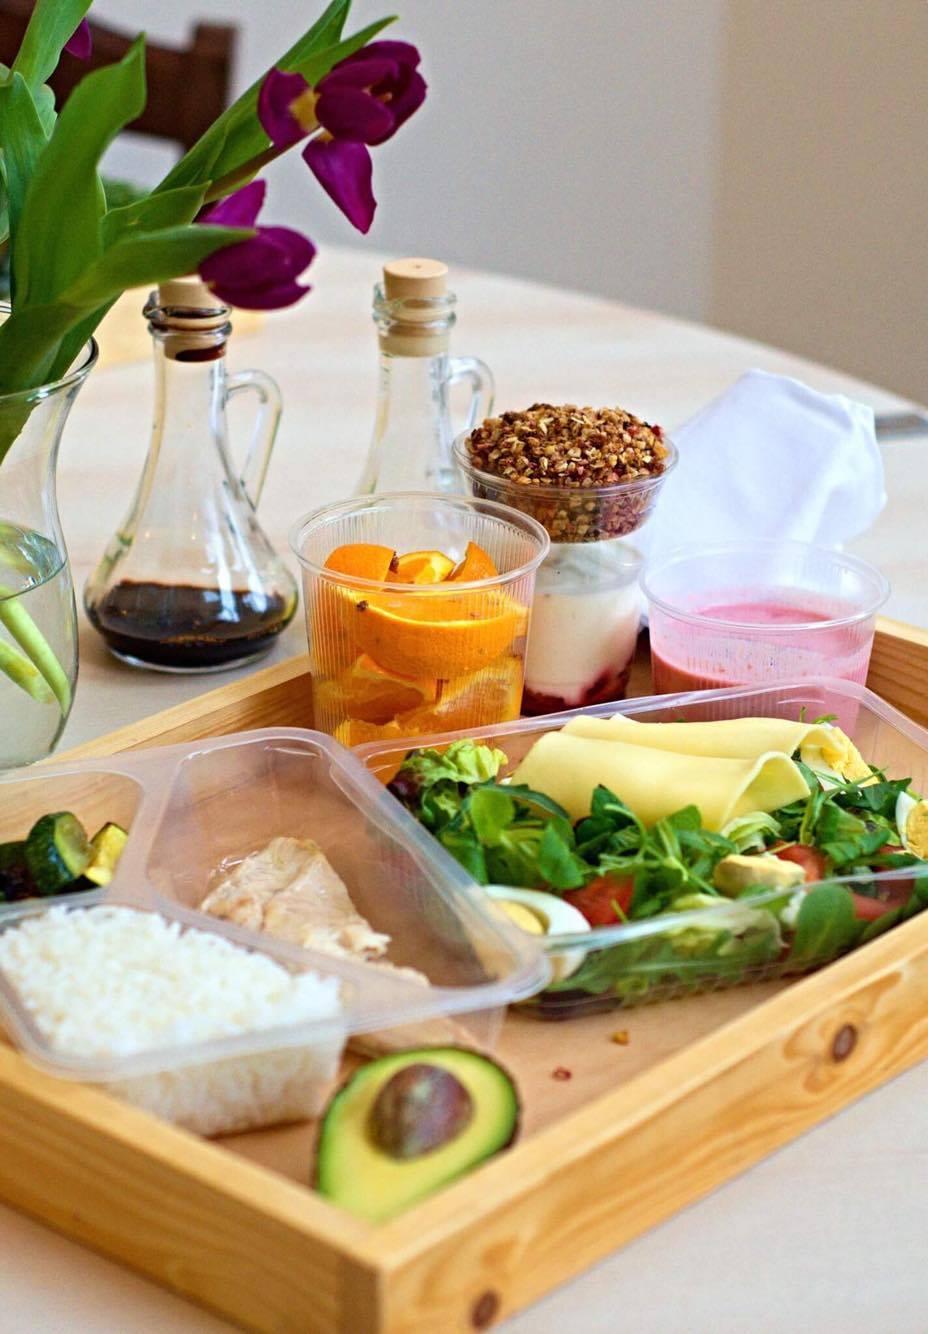 Zdravé a chutné jedlá až ku vám domov